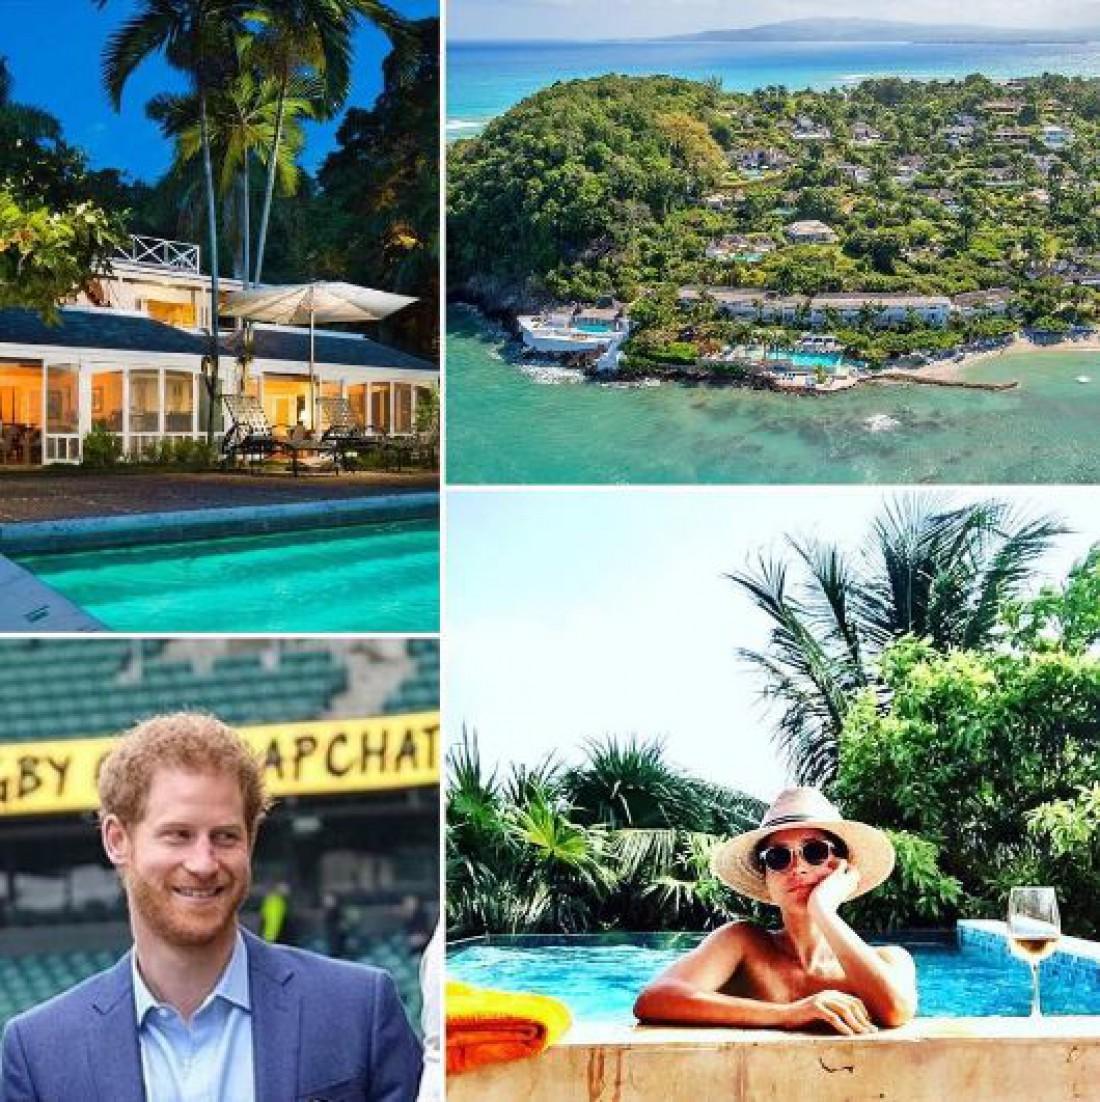 Принц Гарри и Меган Маркл на Ямайке